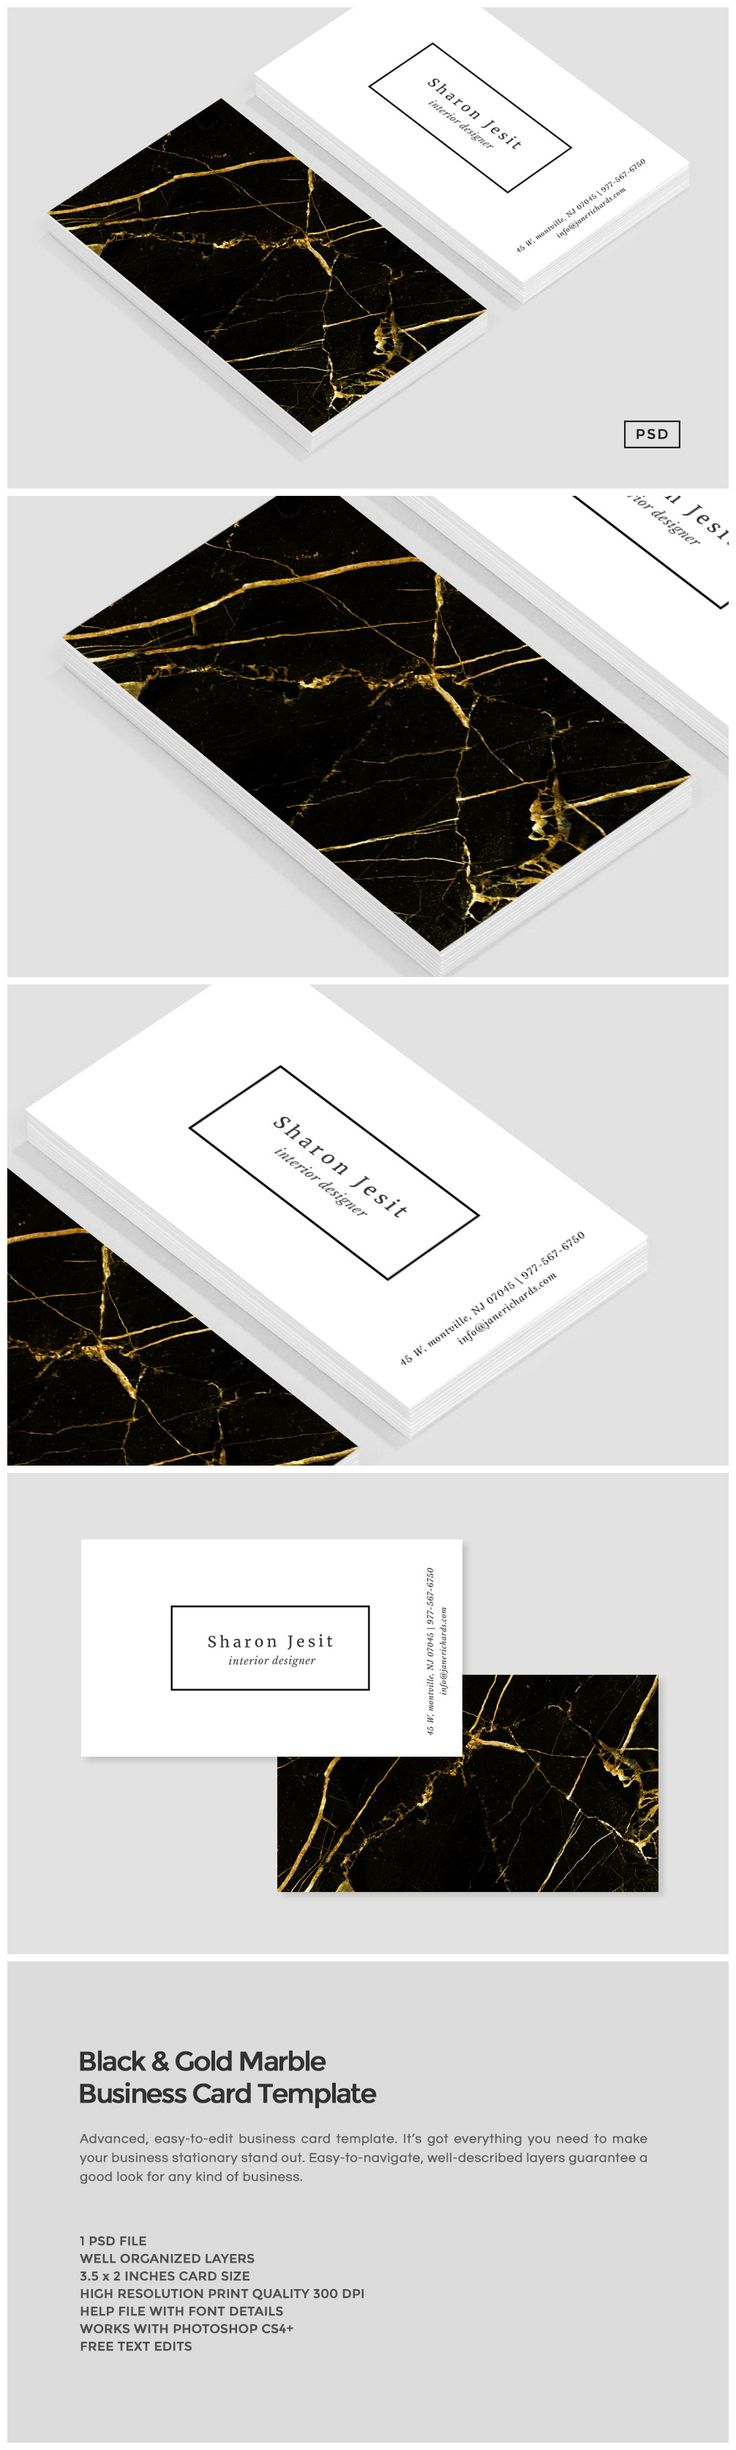 134 best business cards images on Pinterest | Lipsense business ...